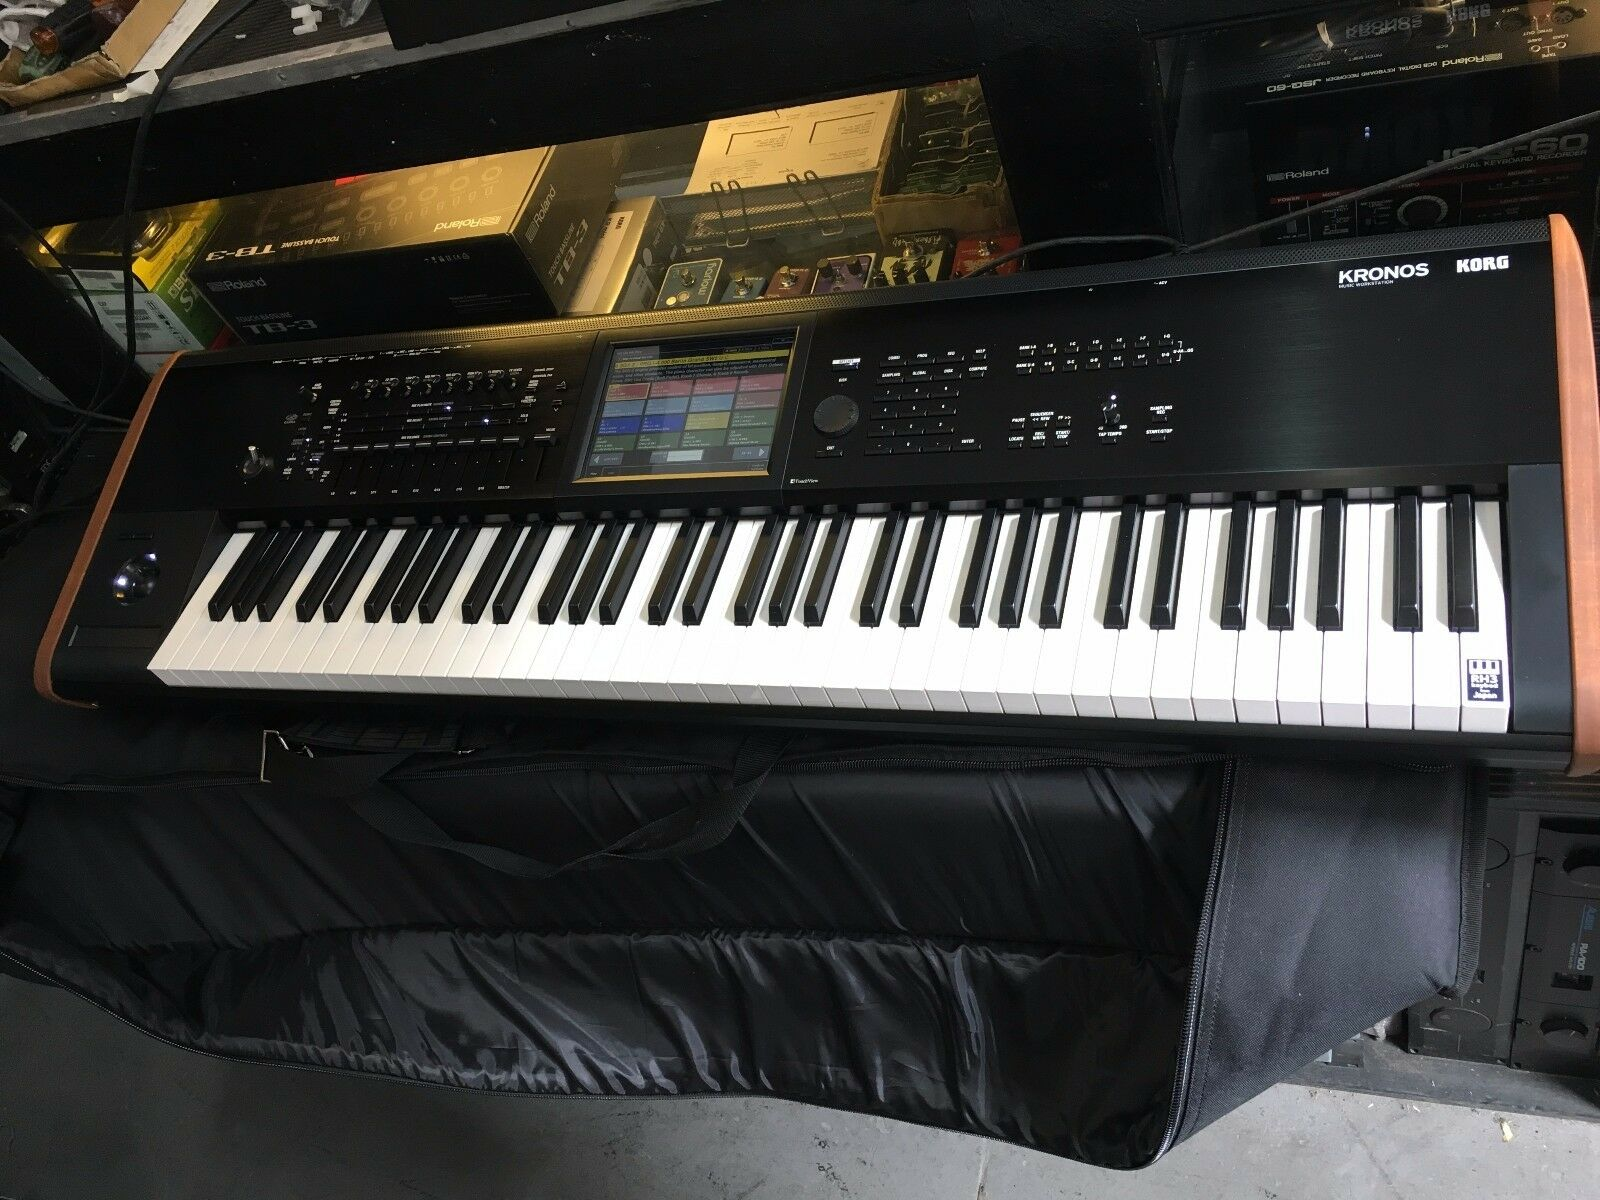 Details about Korg KRONOS 2 /73 -Key keyboard Music Workstation ,KRONOS 7  ,in box //ARMENS//